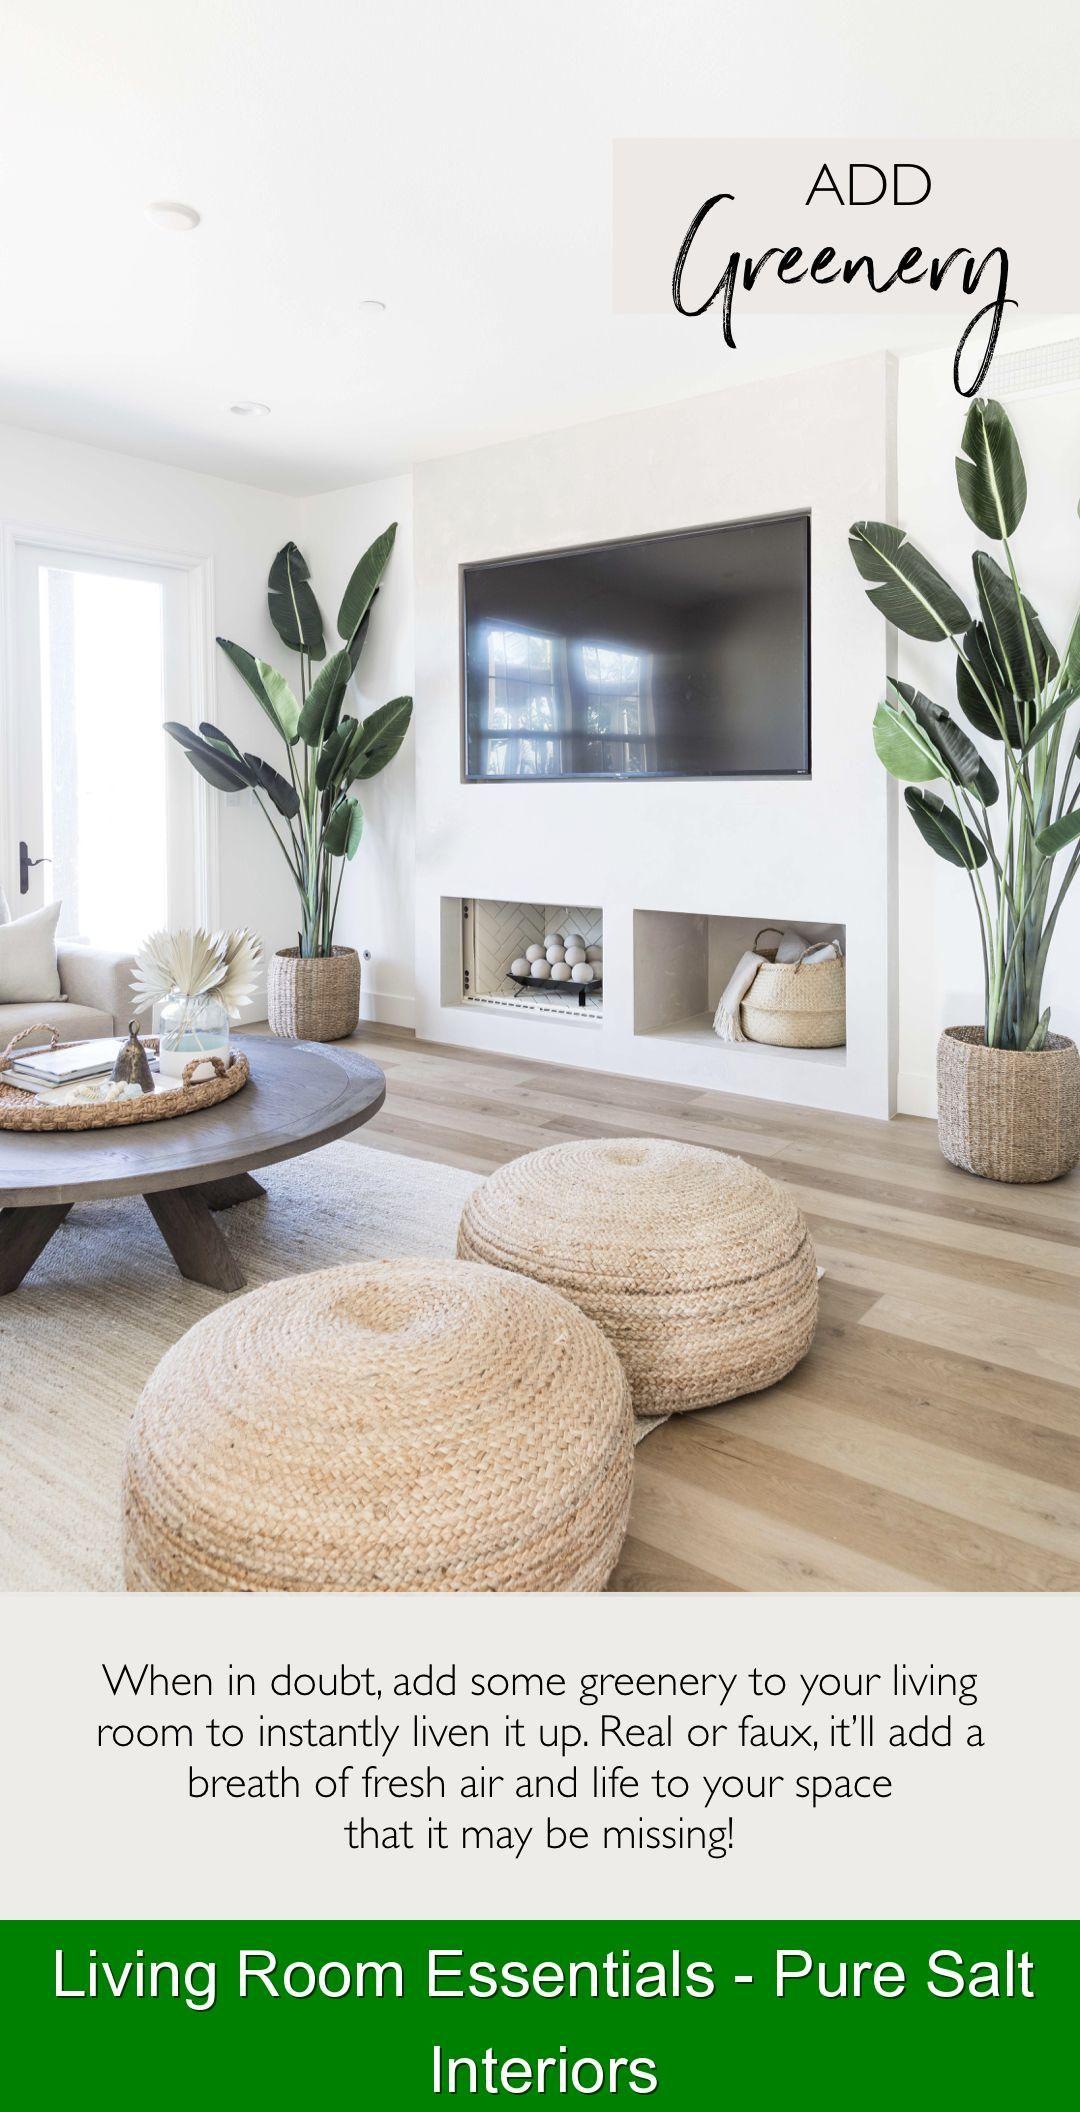 Living Room Essentials - Pure Salt Interiors {62491} #minimalist #home #minimalisthome  Living Room Essentials | INTERIOR DESIGN TIPS AND TRICK | #DesignTips #InteriorDesign #InteriorDesignTips #Tips #DecorTips #DesignGuide #InteriorDesignGuide #HomeDecor #livingroomessentials